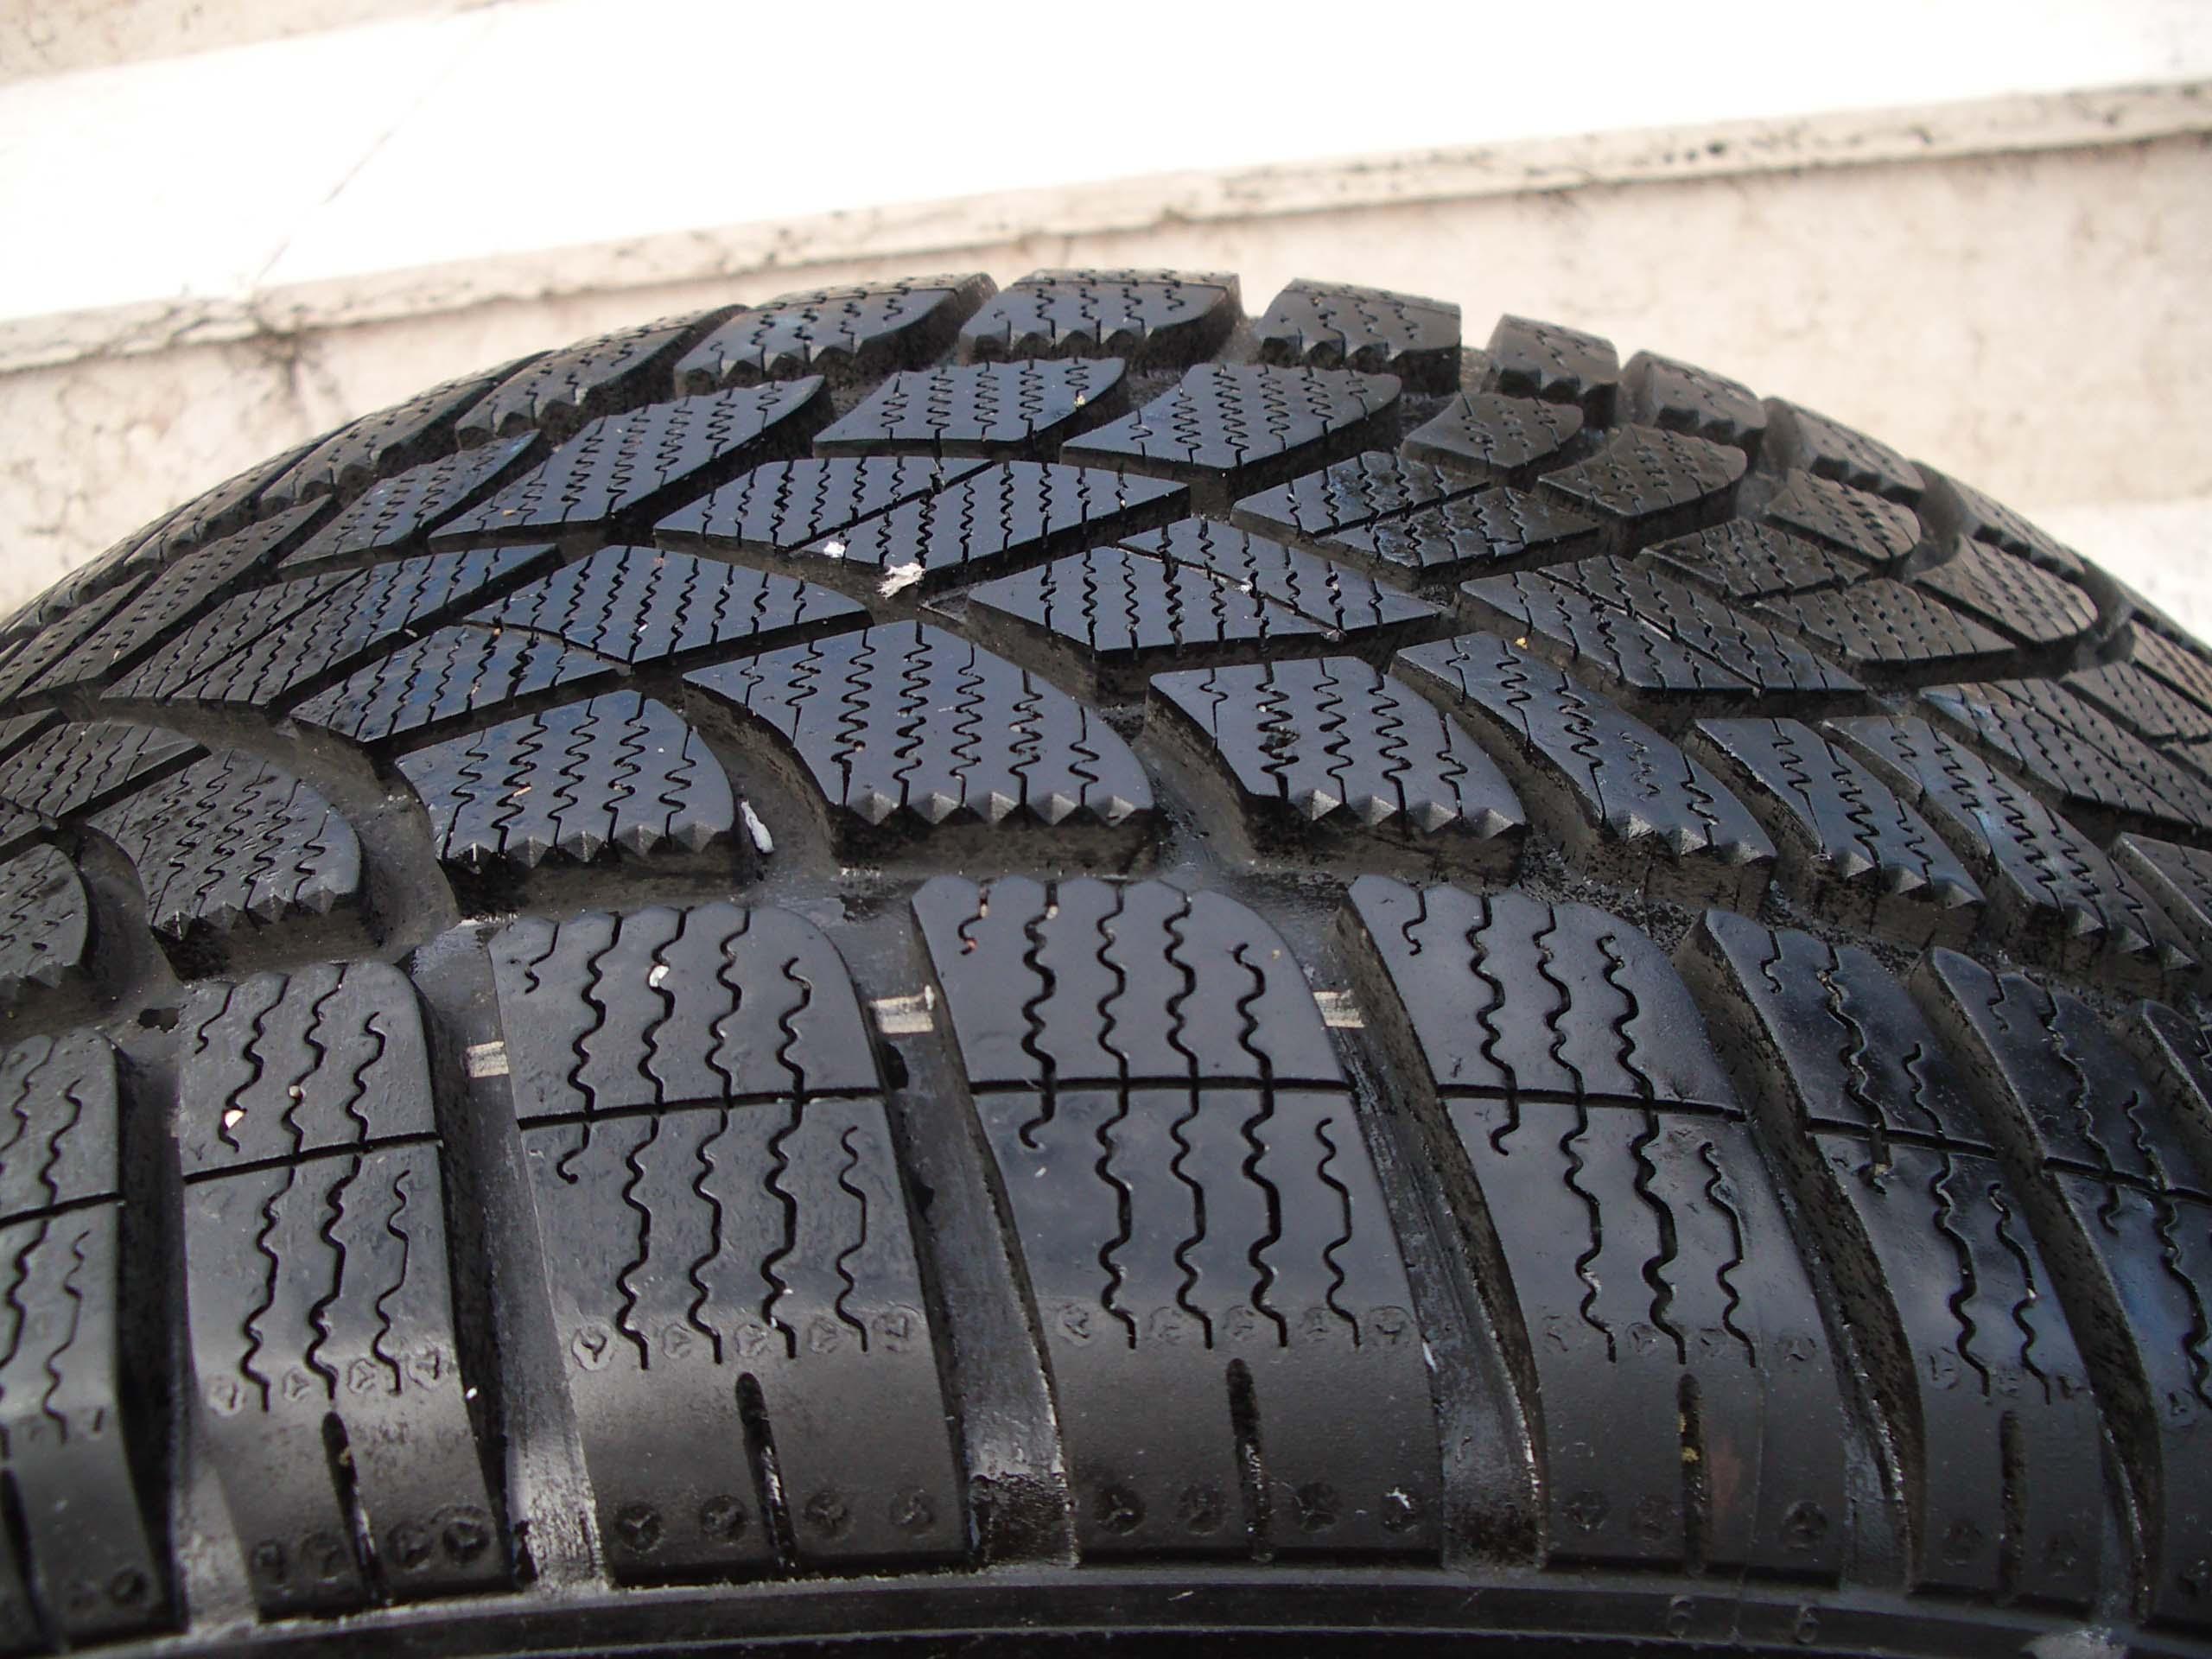 Le gomme termiche - image 000228-000001287 on http://auto.motori.net